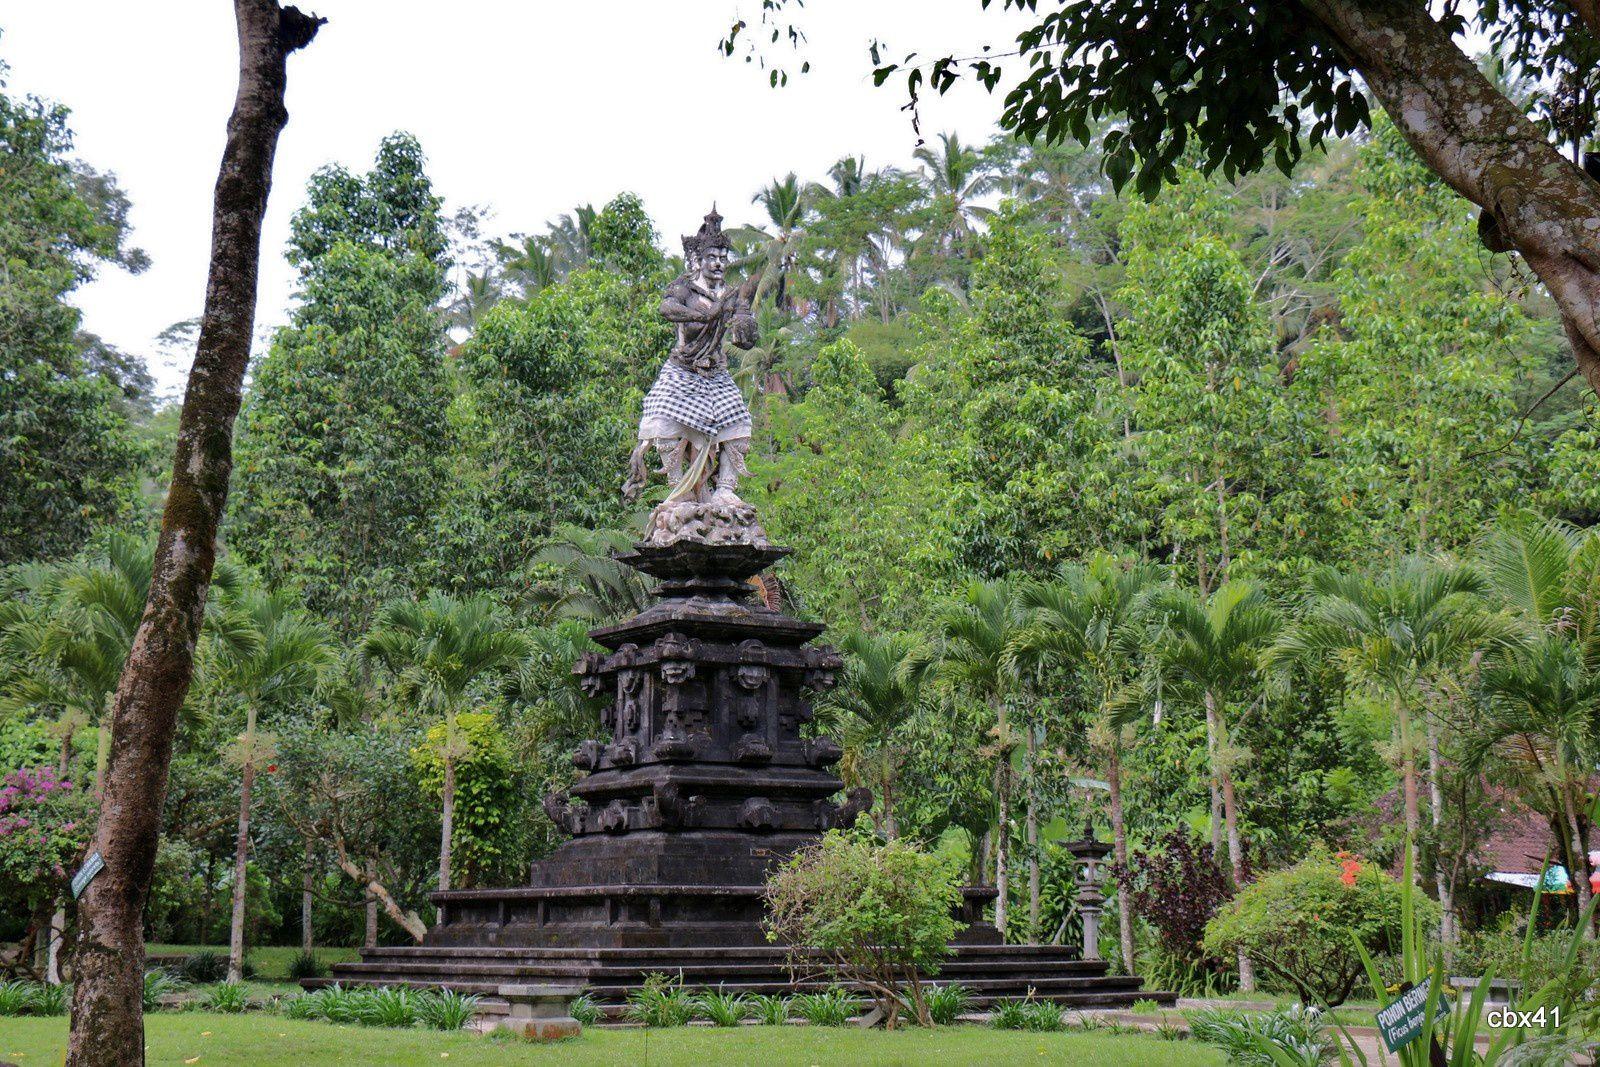 L'entrée du temple de Tirta Empul, Tampaksiring (Bali, Indonésie)